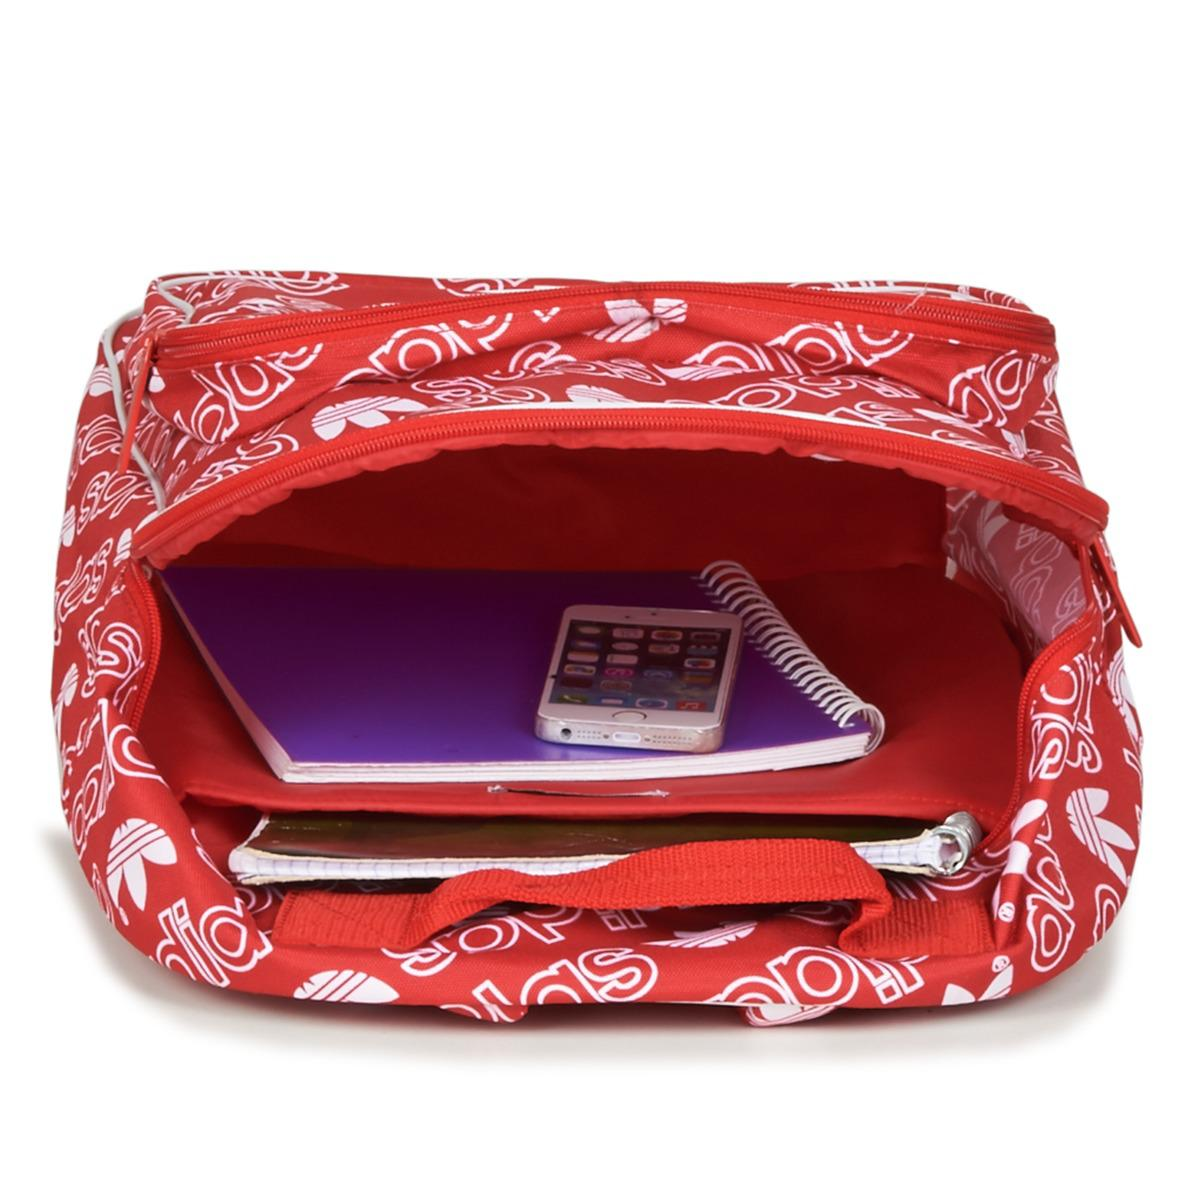 Adidas - Red Bp Class Ac Gr Backpack for Men - Lyst. View fullscreen 031b98fe0bef8